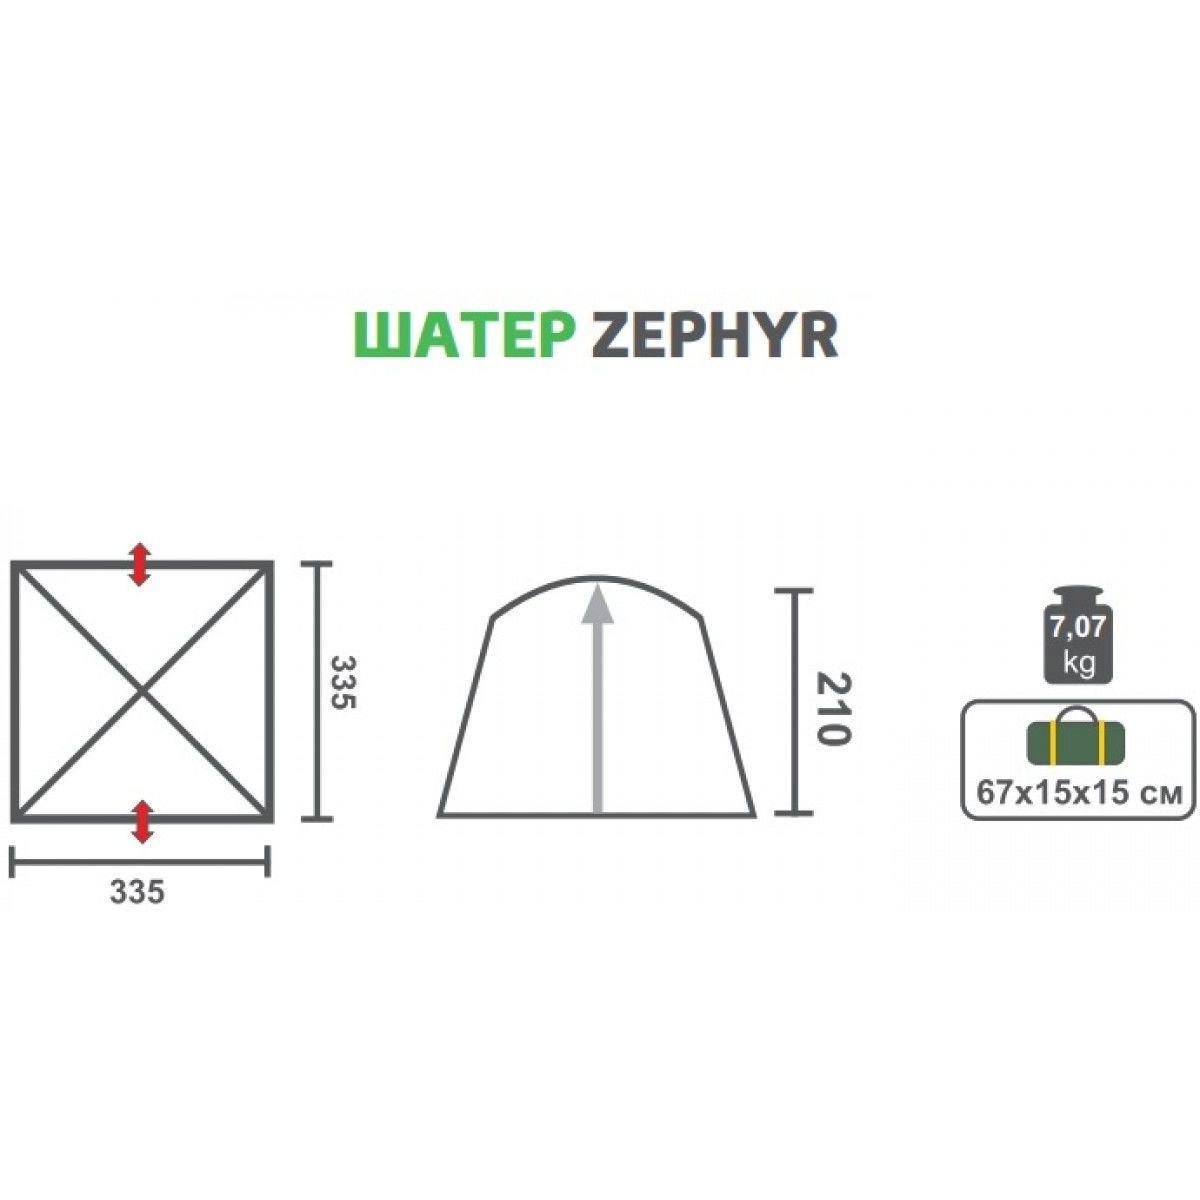 Шатер zephyr (hs-3075) helios tr-90646 - фото 2